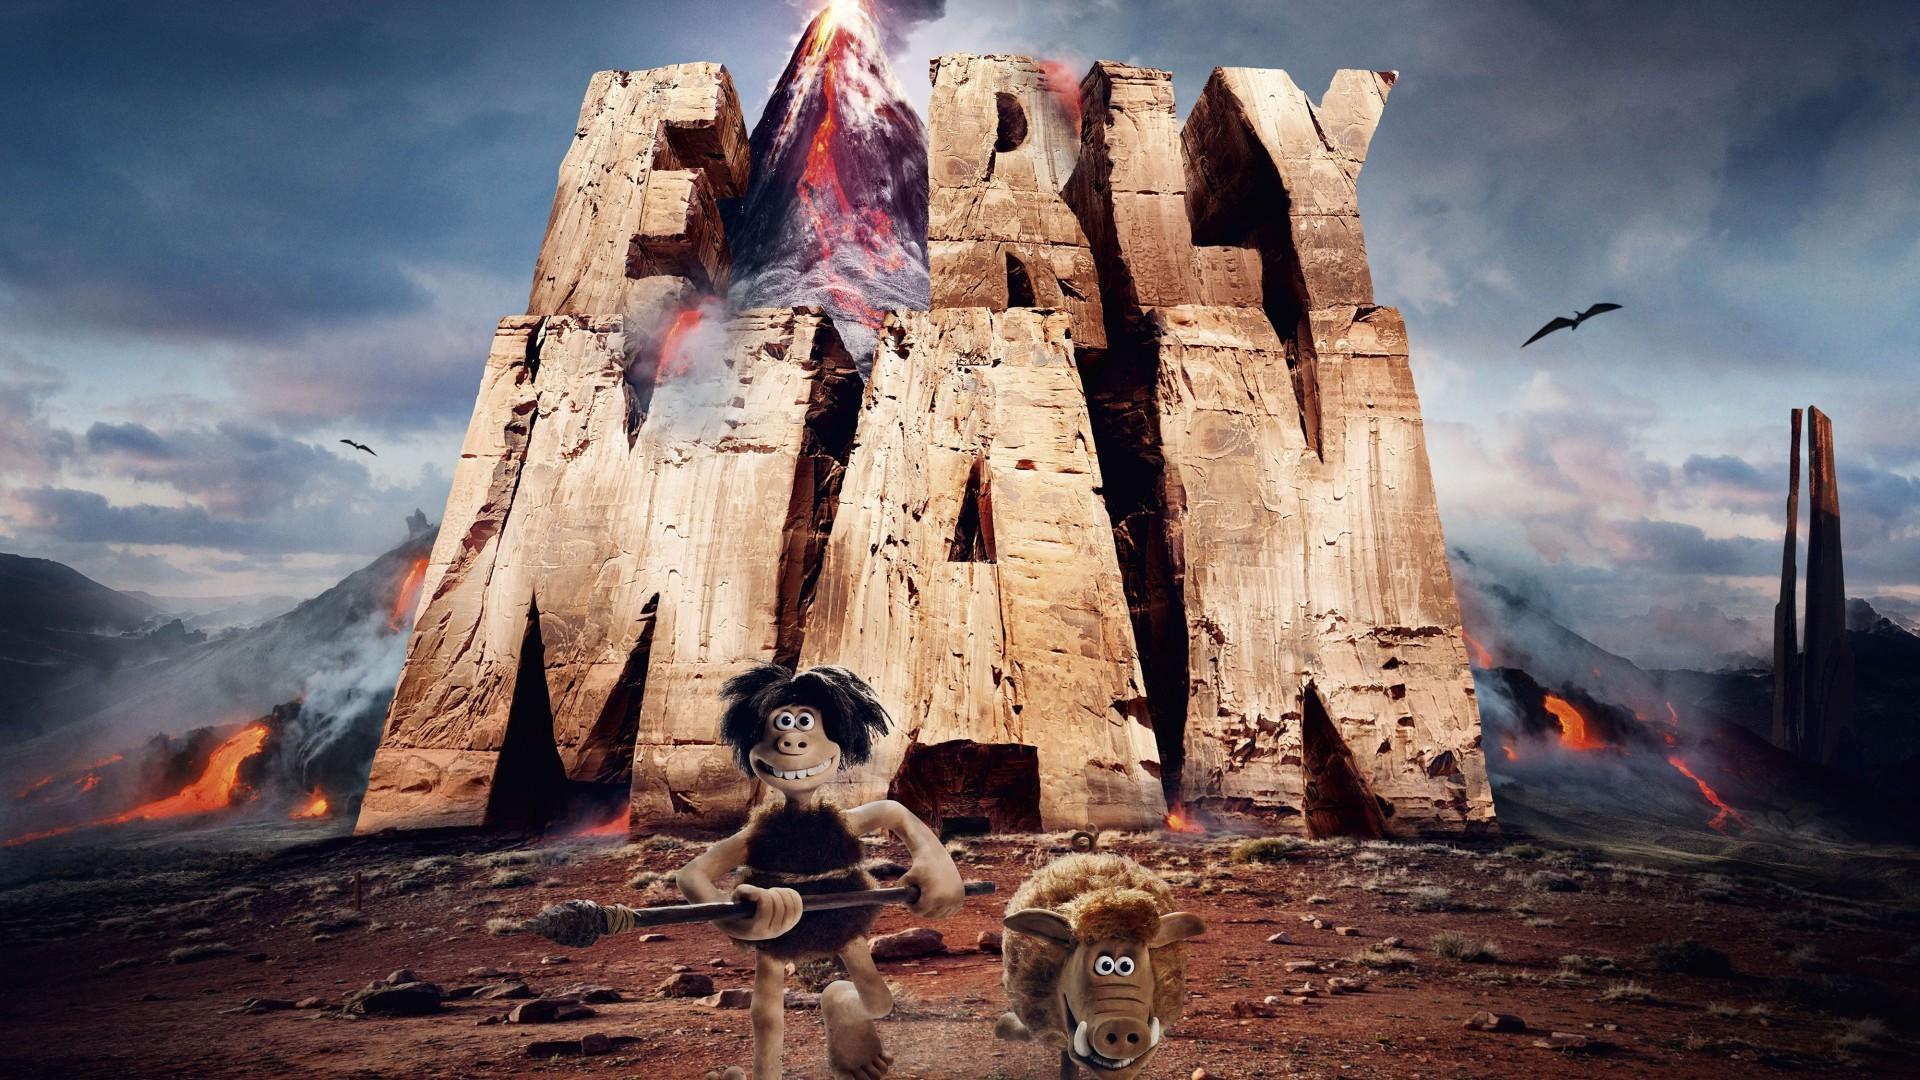 Early Man 2018 Animation Hd Wallpaper